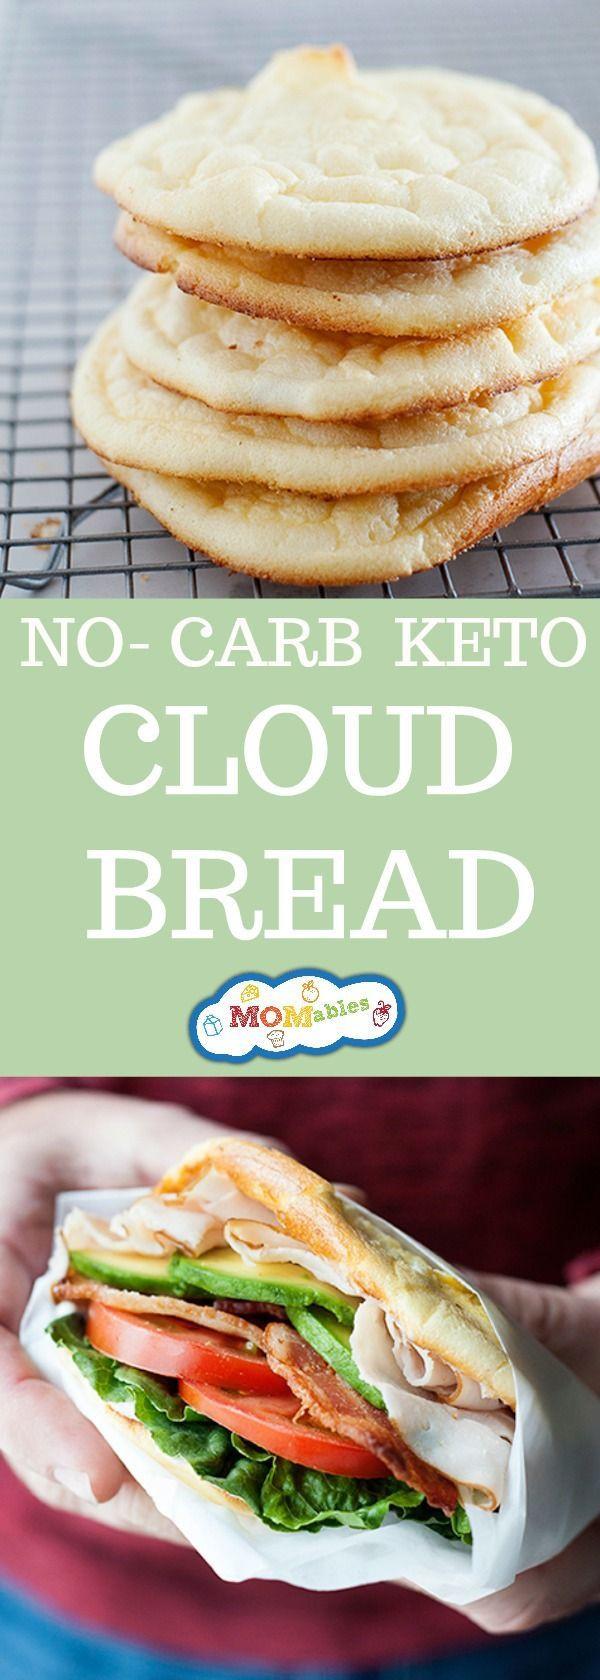 Atkins Cloud Bread  The 25 best No carb cloud bread ideas on Pinterest